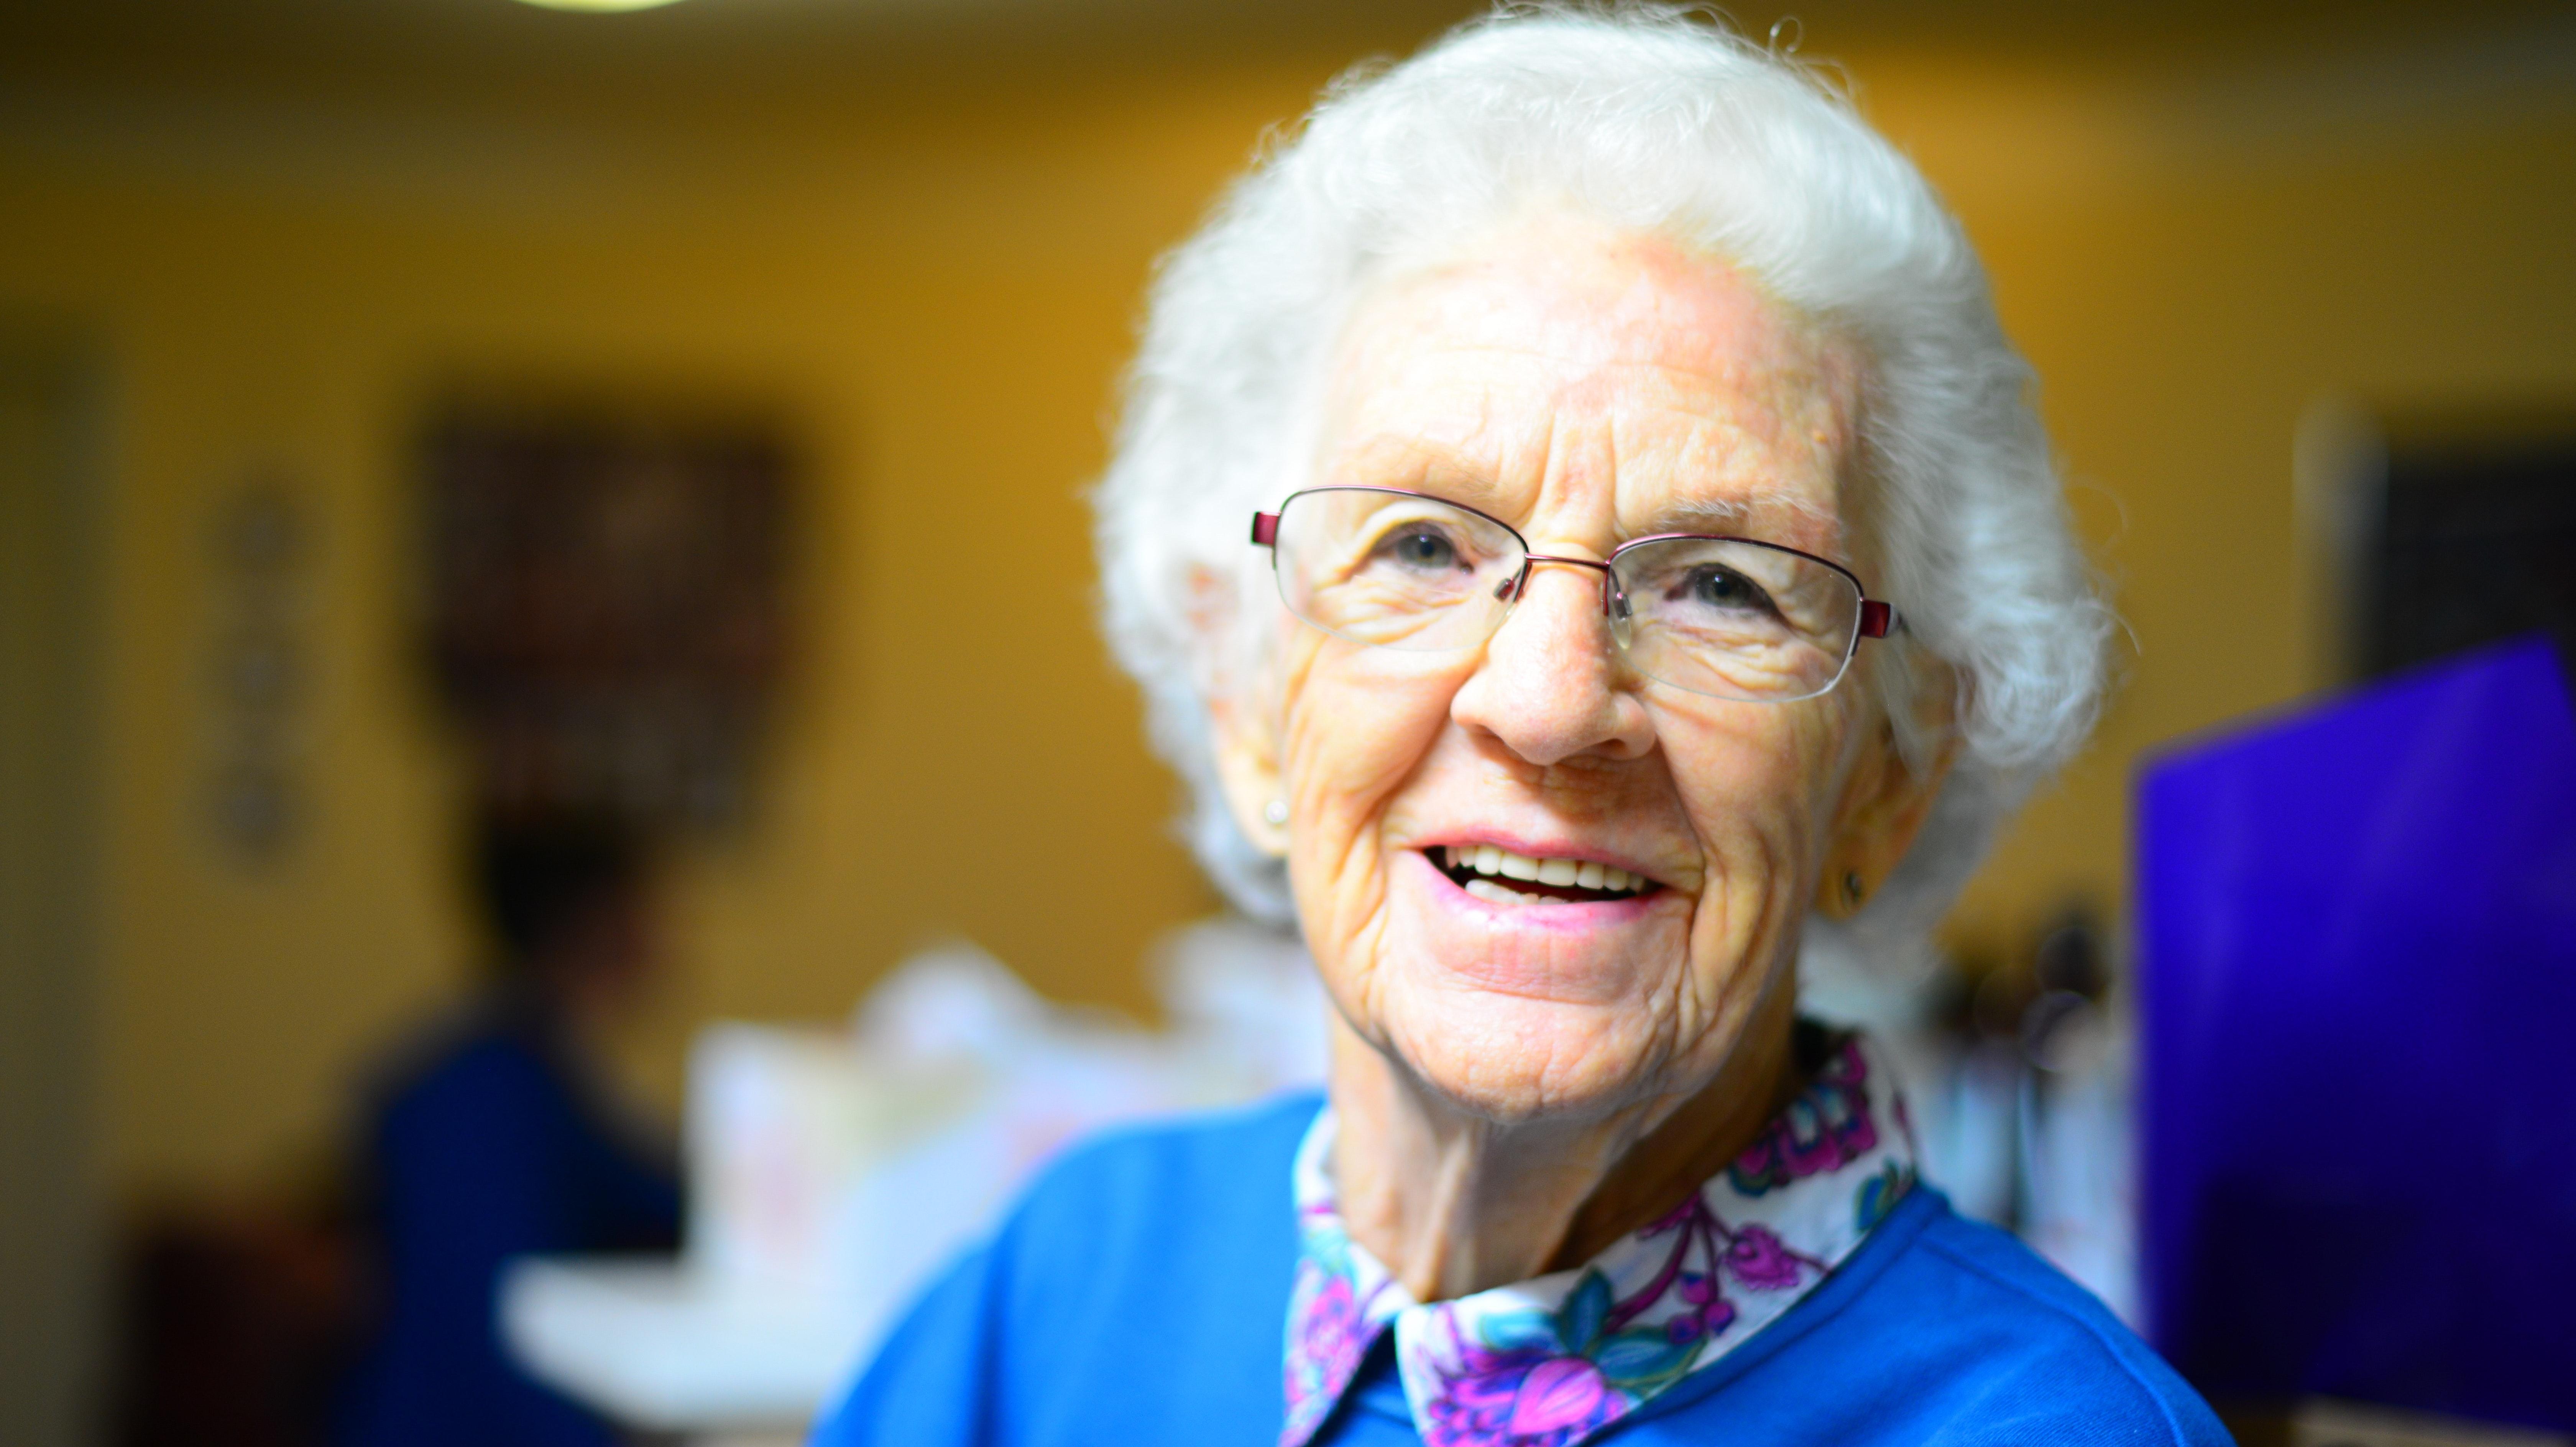 1000 interesting old lady photos pexels free stock photos